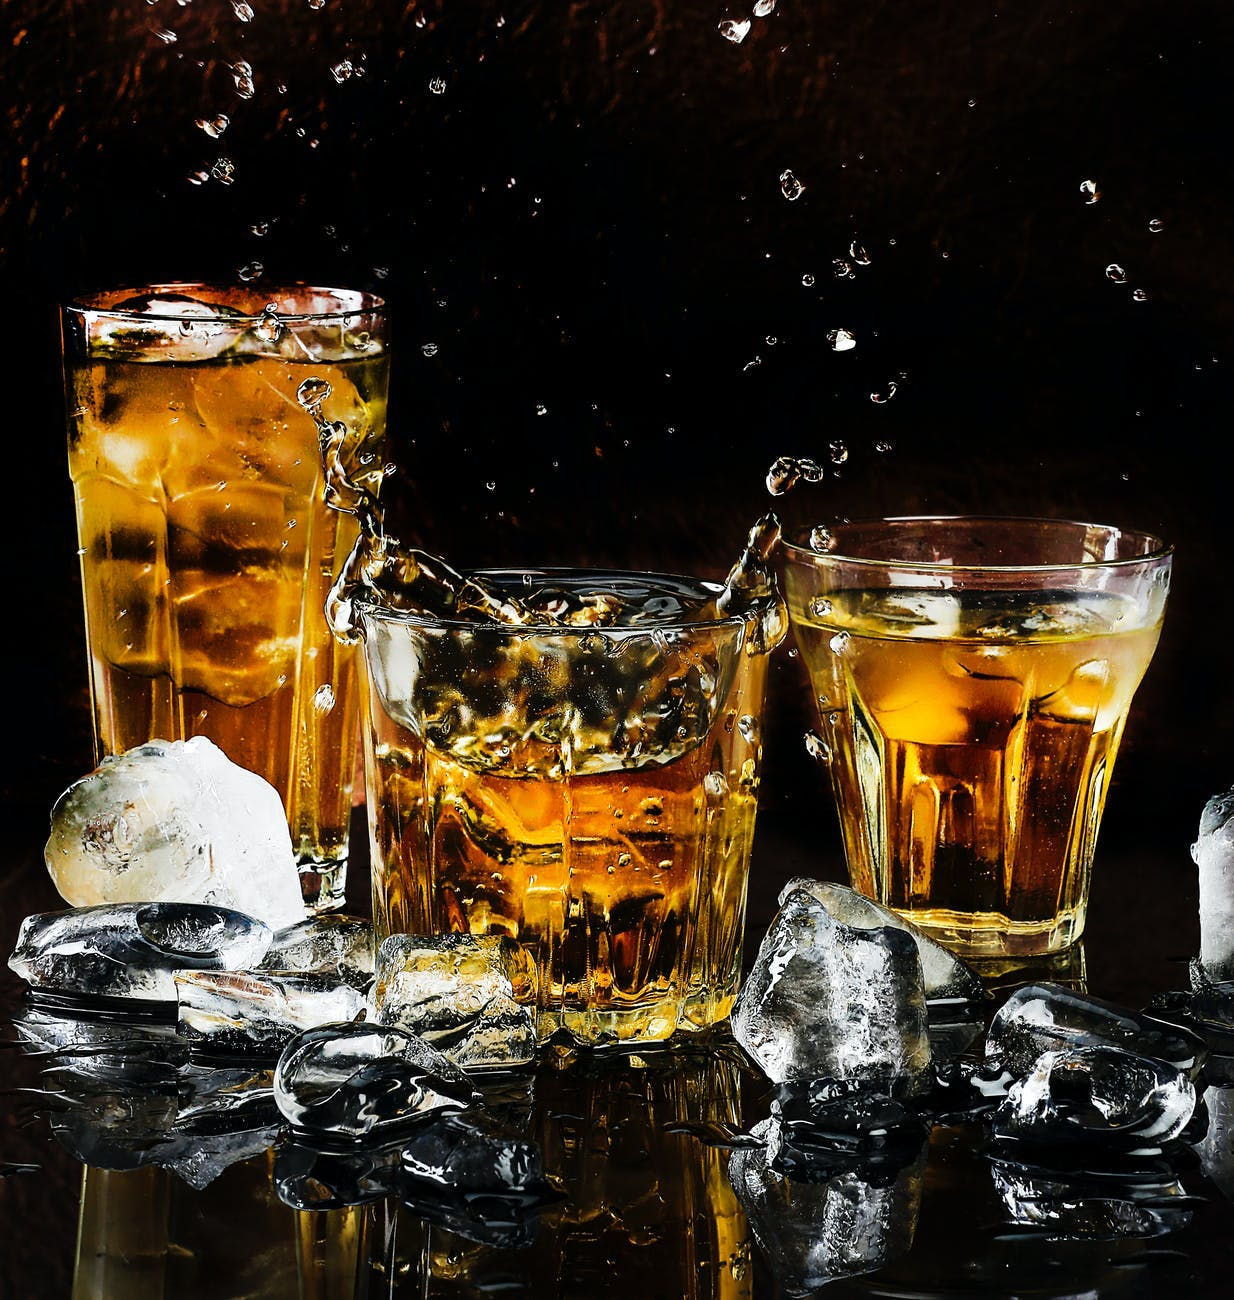 Tableware,Liquid,Drinkware,Tennessee whiskey,Stemware,Water,Cognac,Rusty nail,Amber,Barware